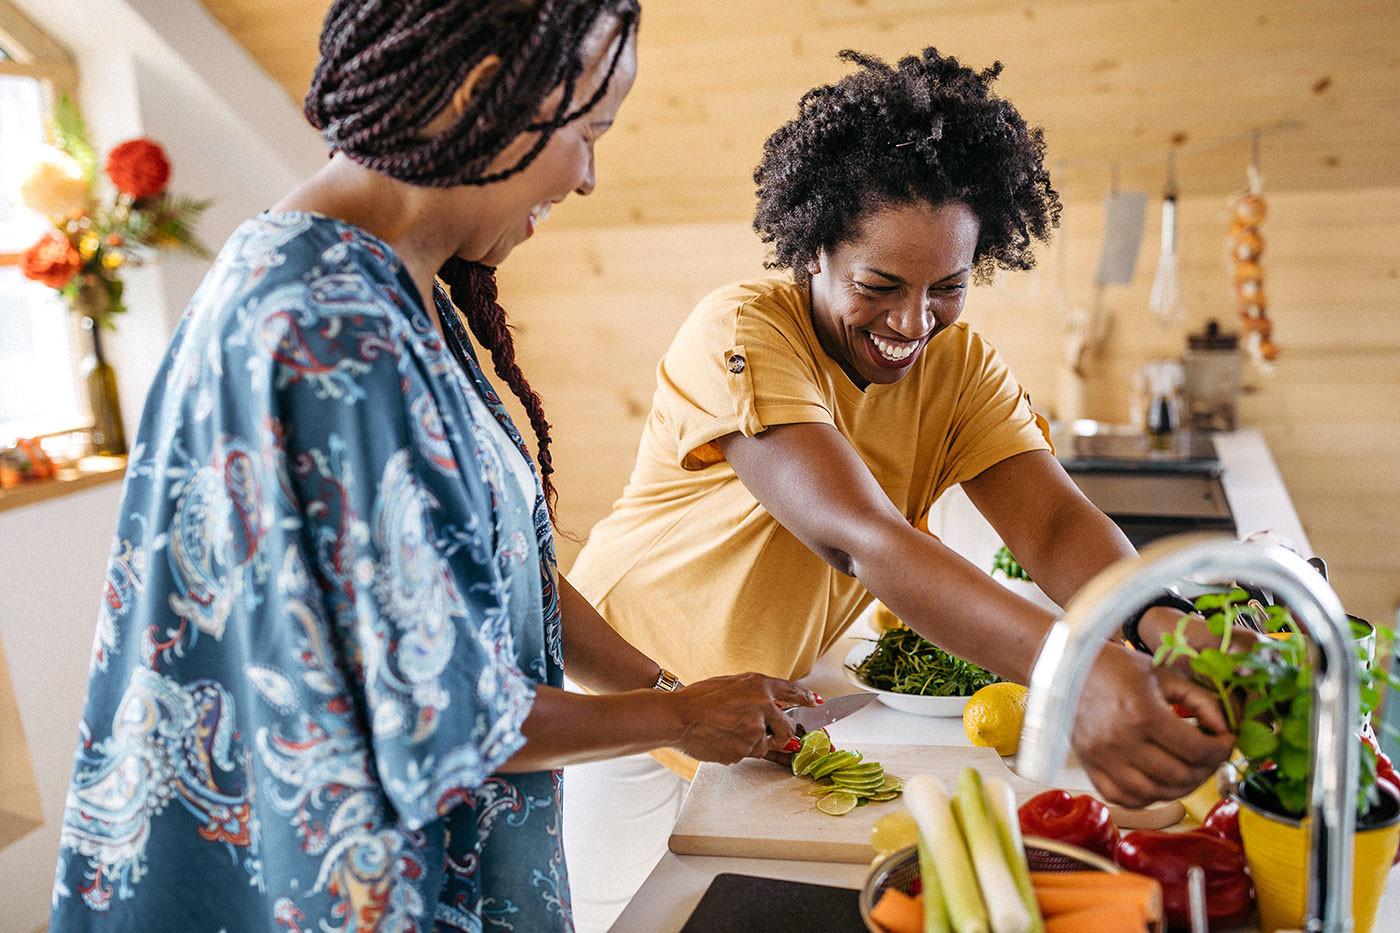 two women washing vegetables